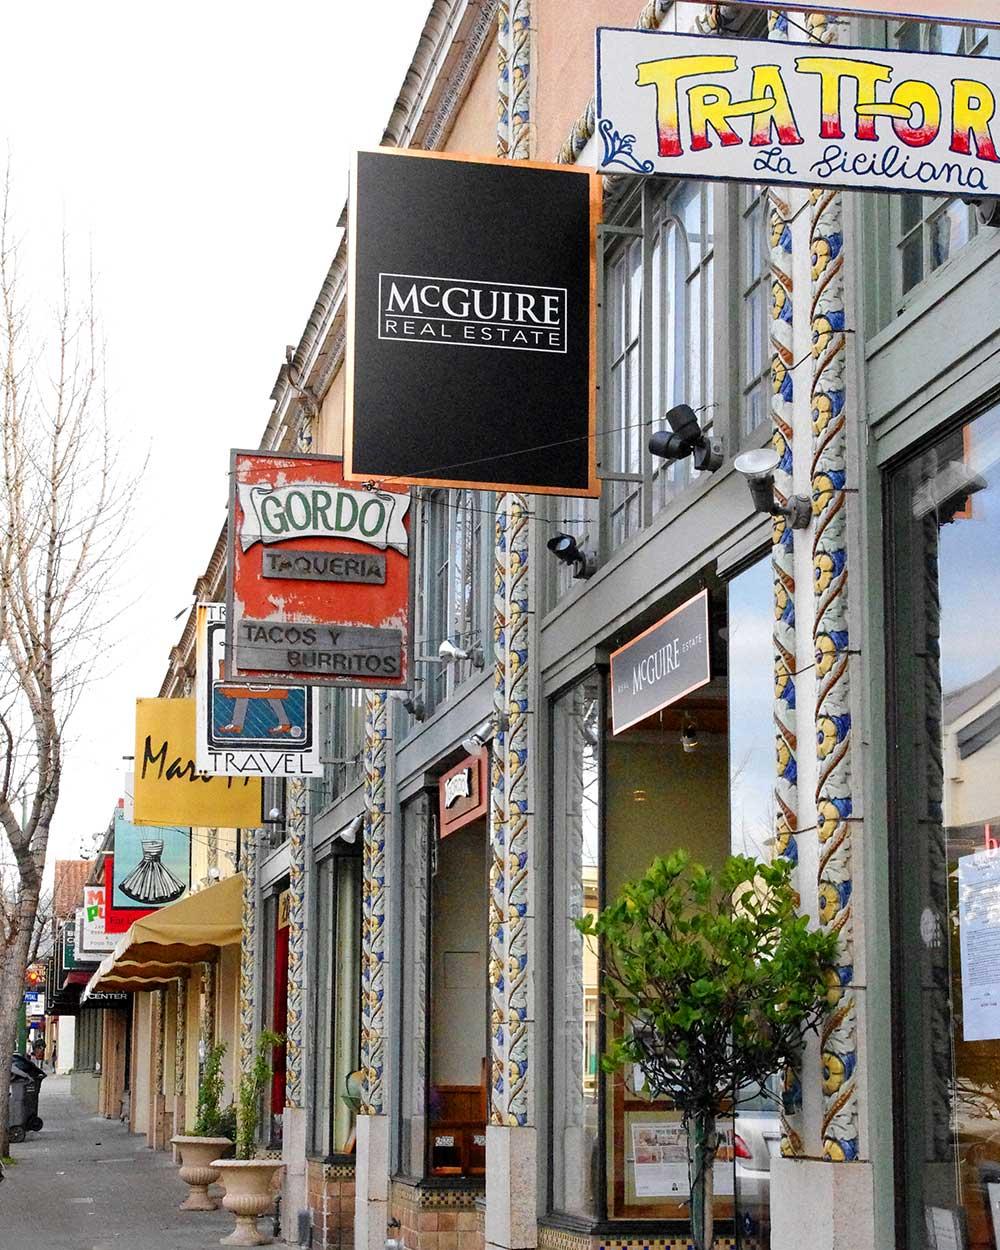 McGuire Real Estate